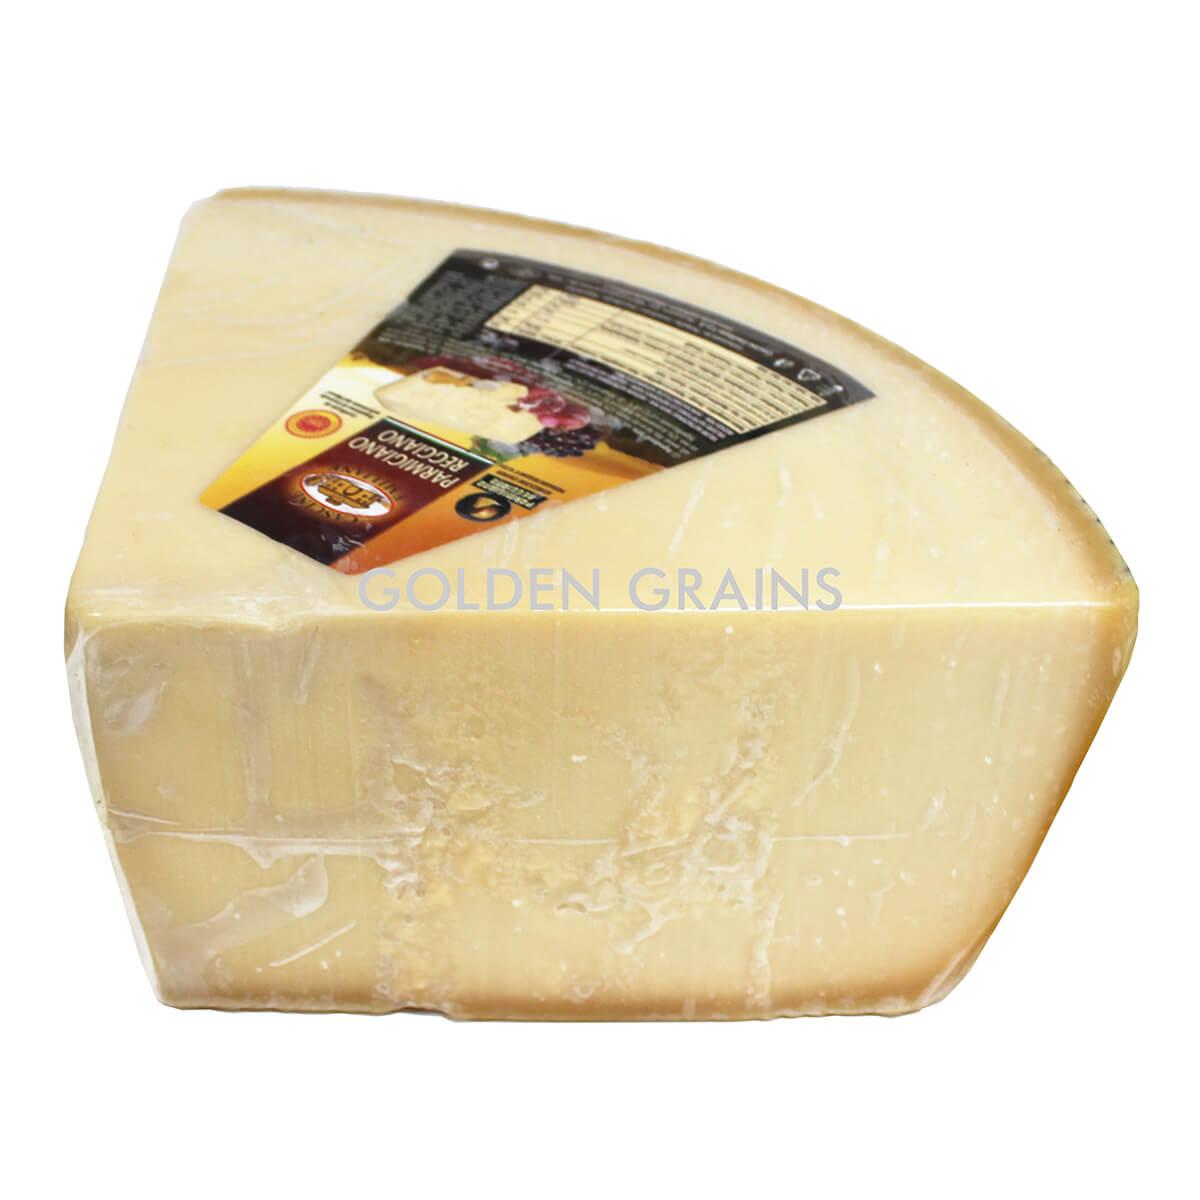 Golden Grains Dubai Export - Parmigiano Reggiano - Side.jpg